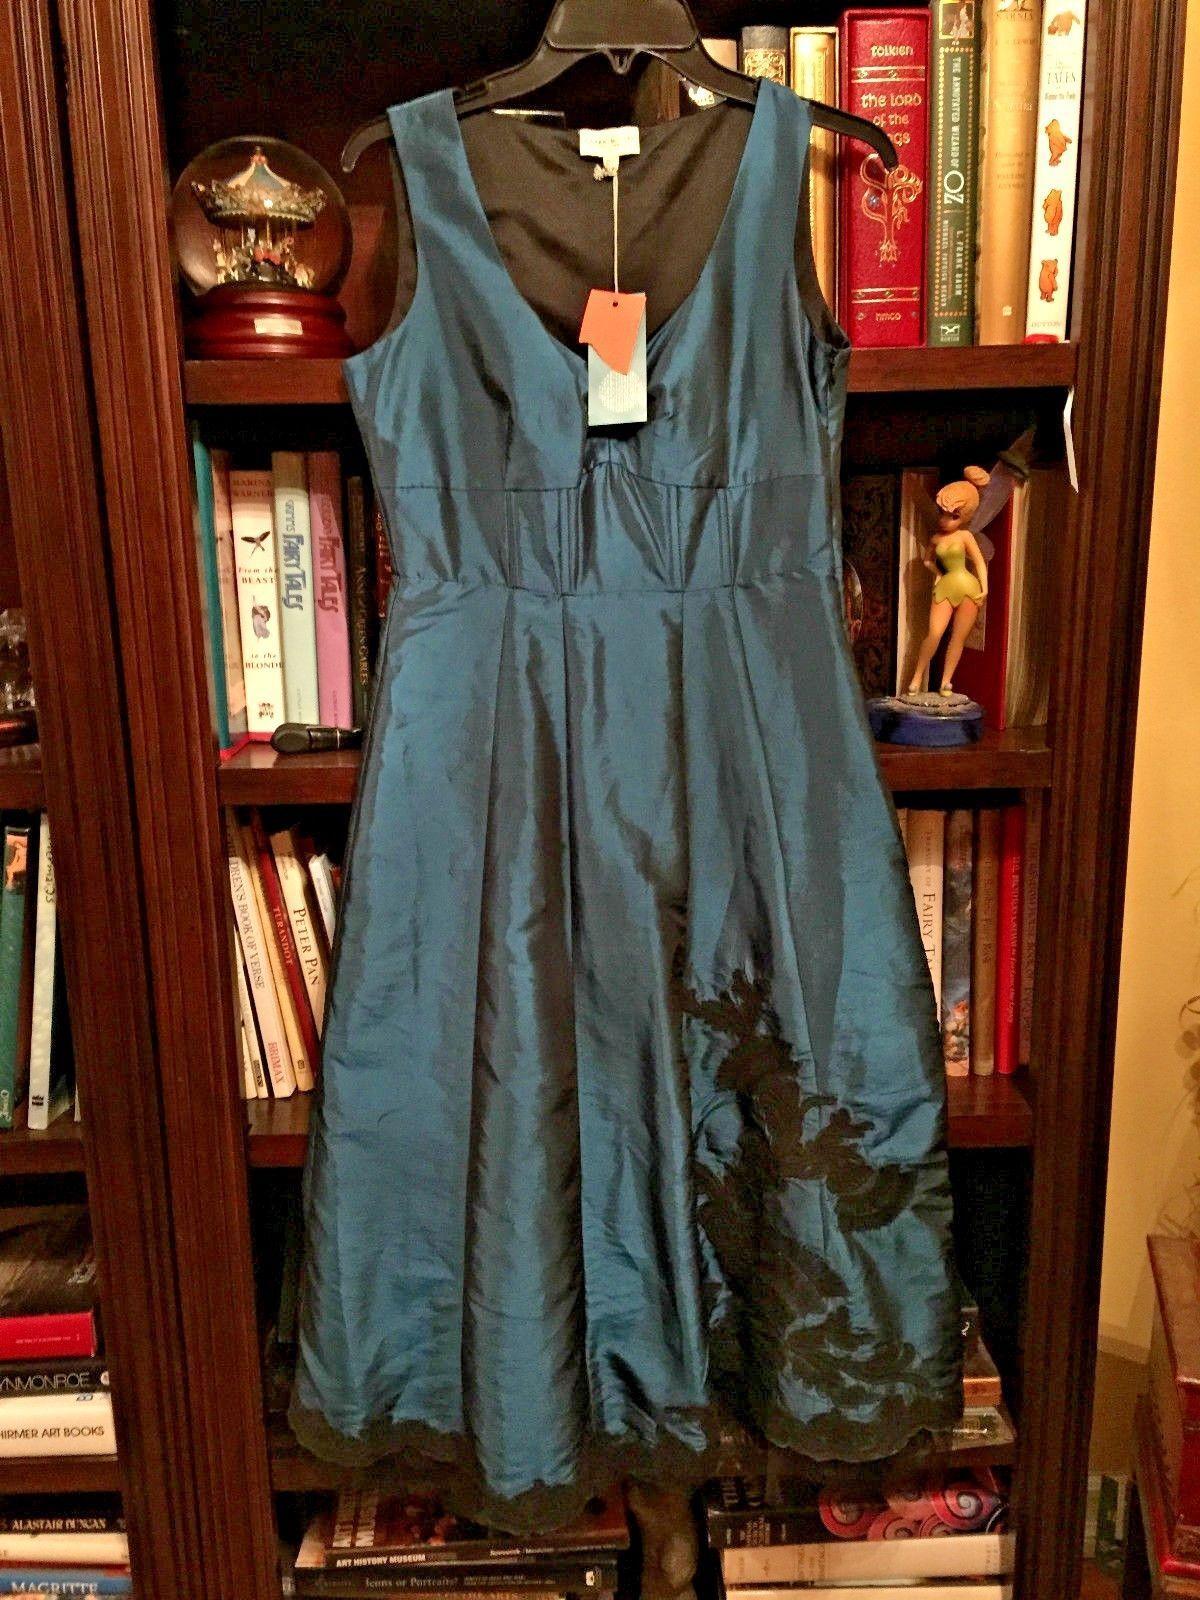 Karen Millen Teal Party Party Party Dress - NWT - Size 8 b84e59